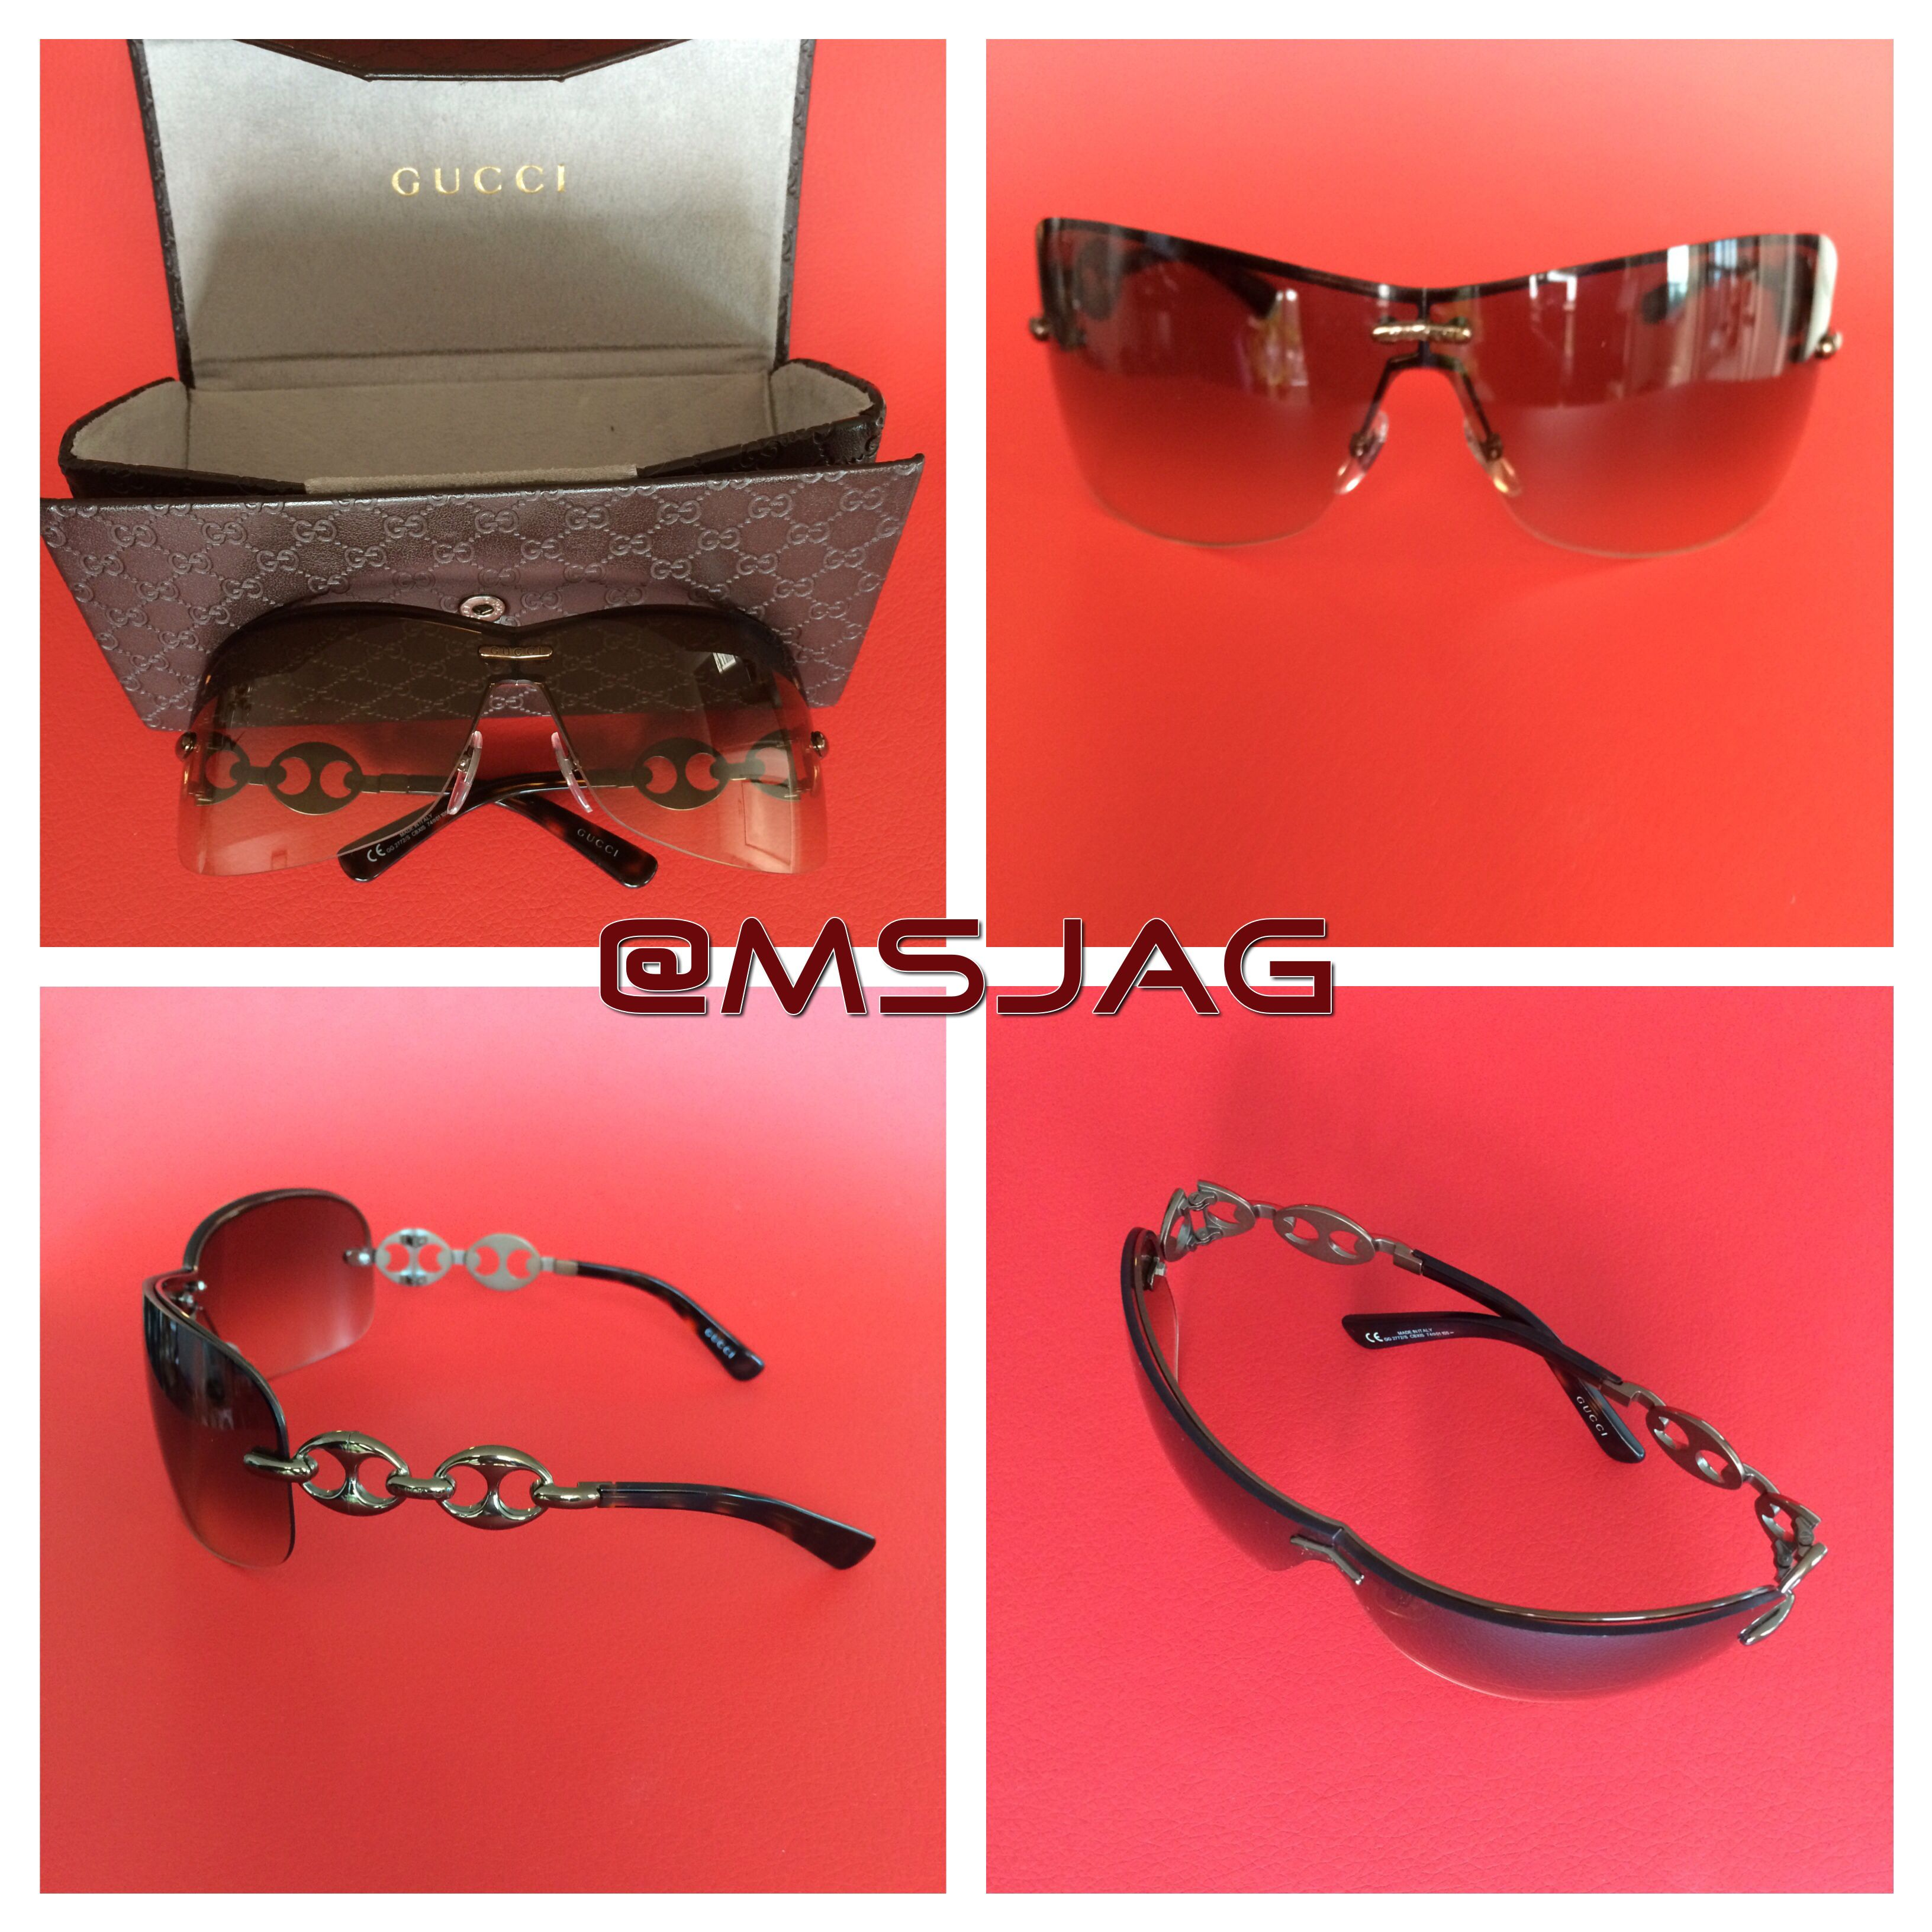 Loving my new Gucci sunglasses!